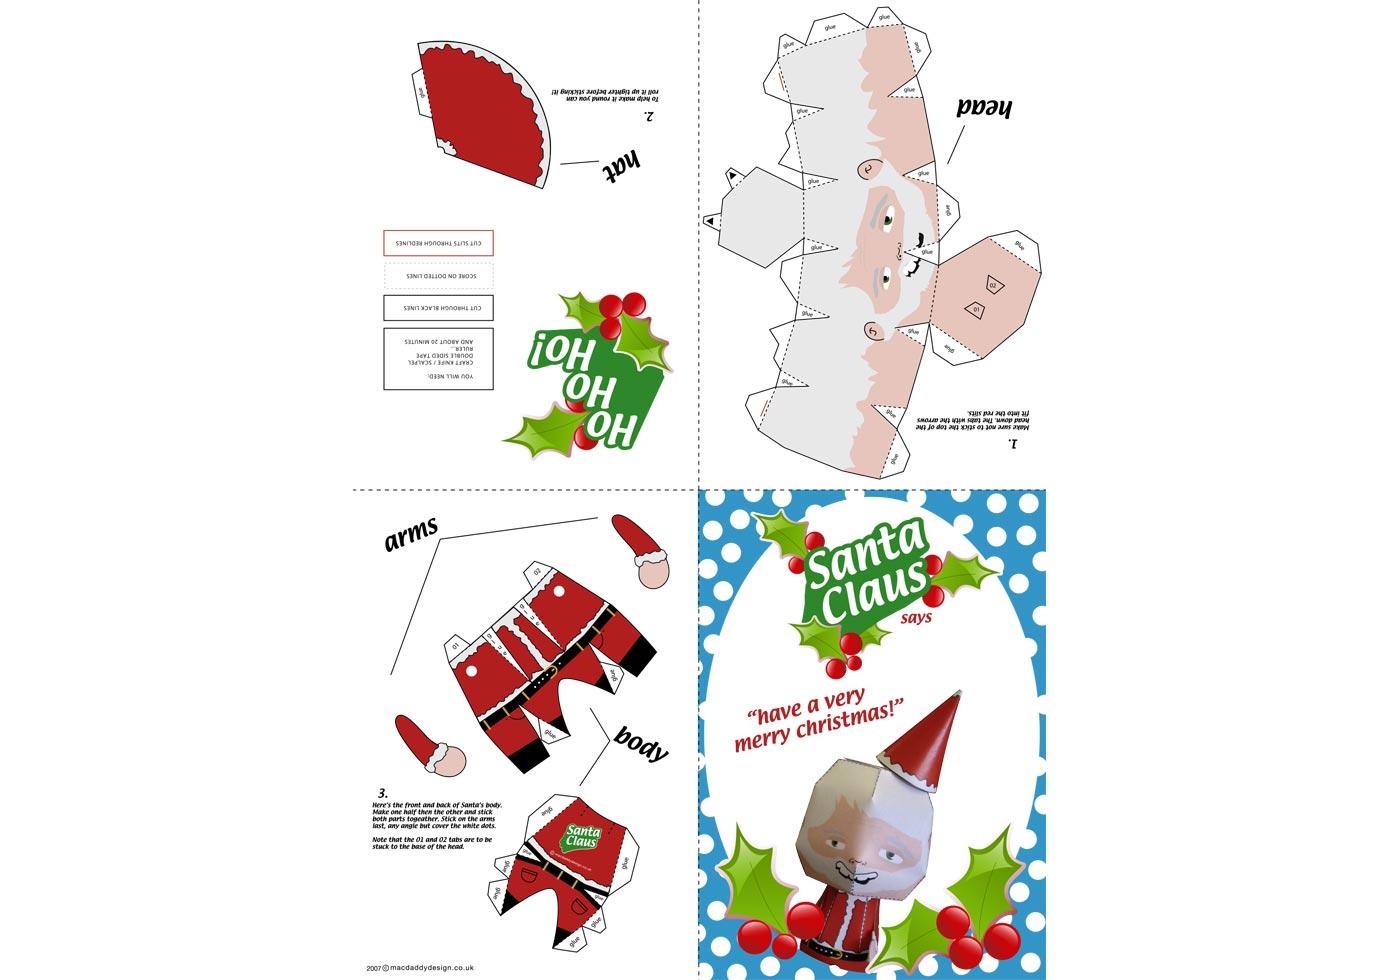 Santa Claus Paper Craft - Download Free Vector Art, Stock ...